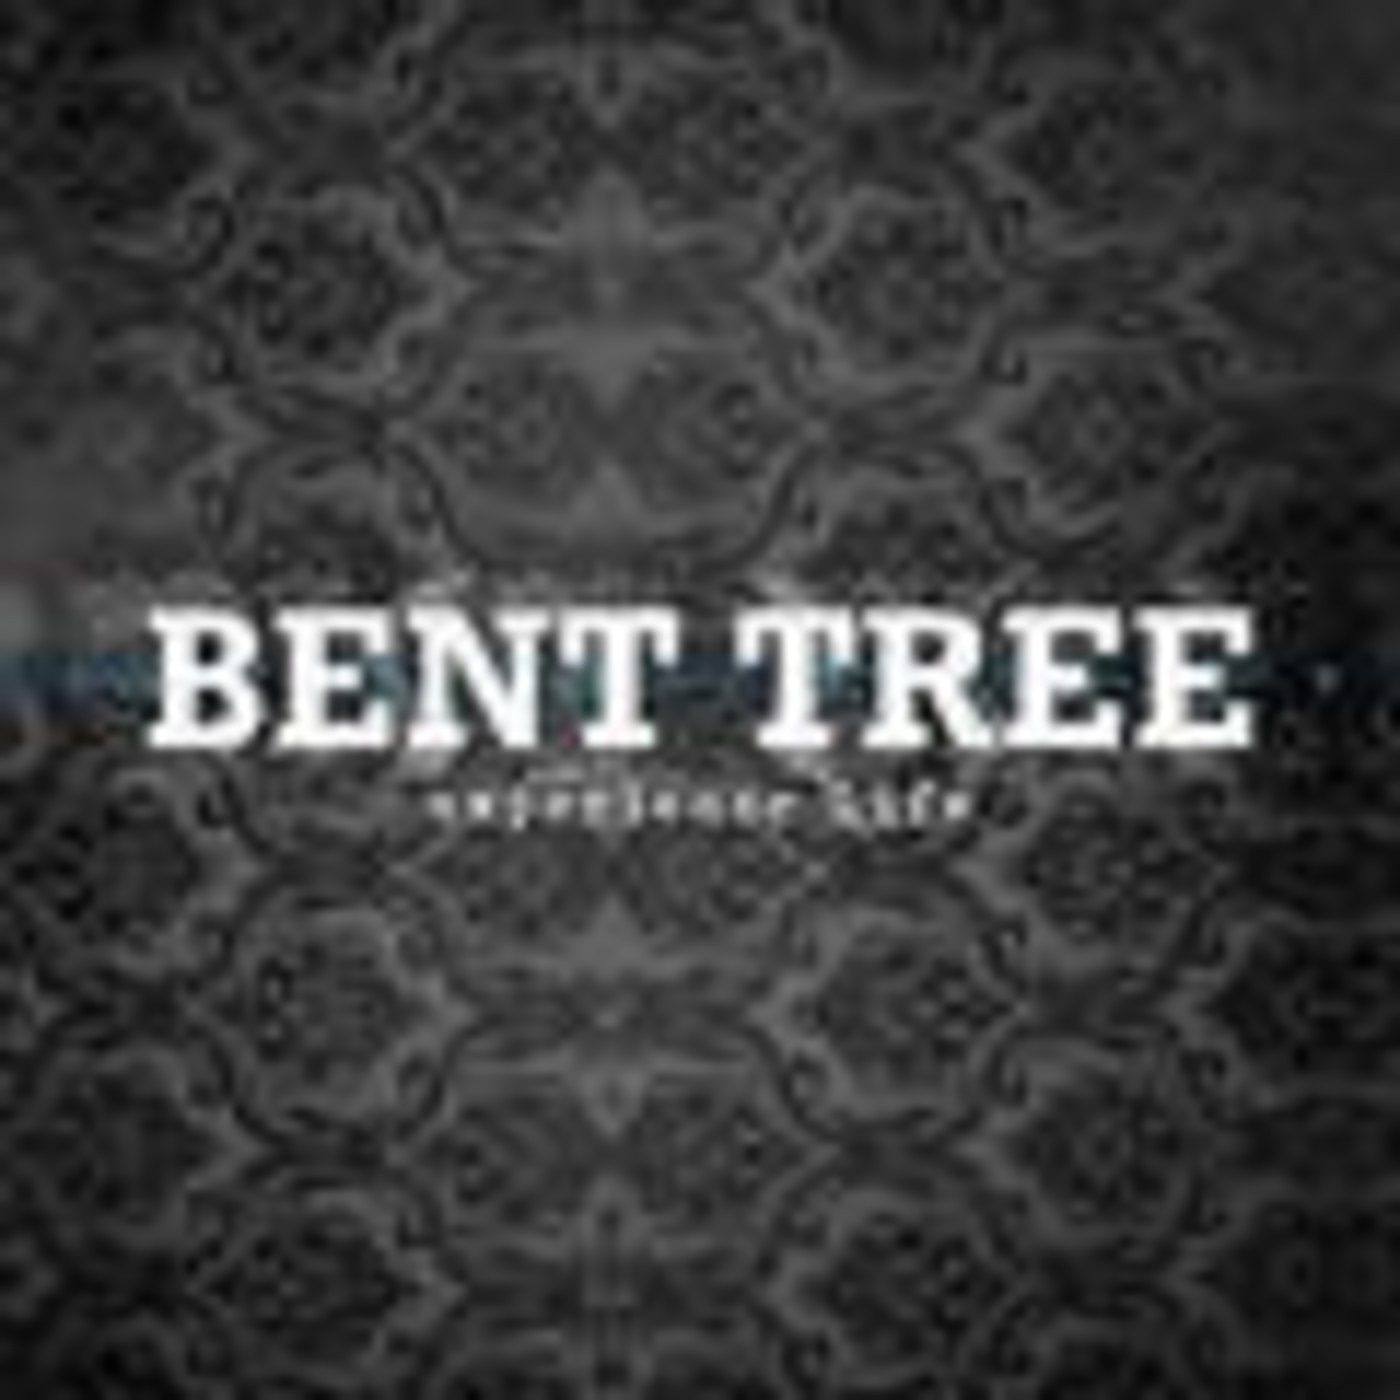 Bent Tree, Dallas, Texas